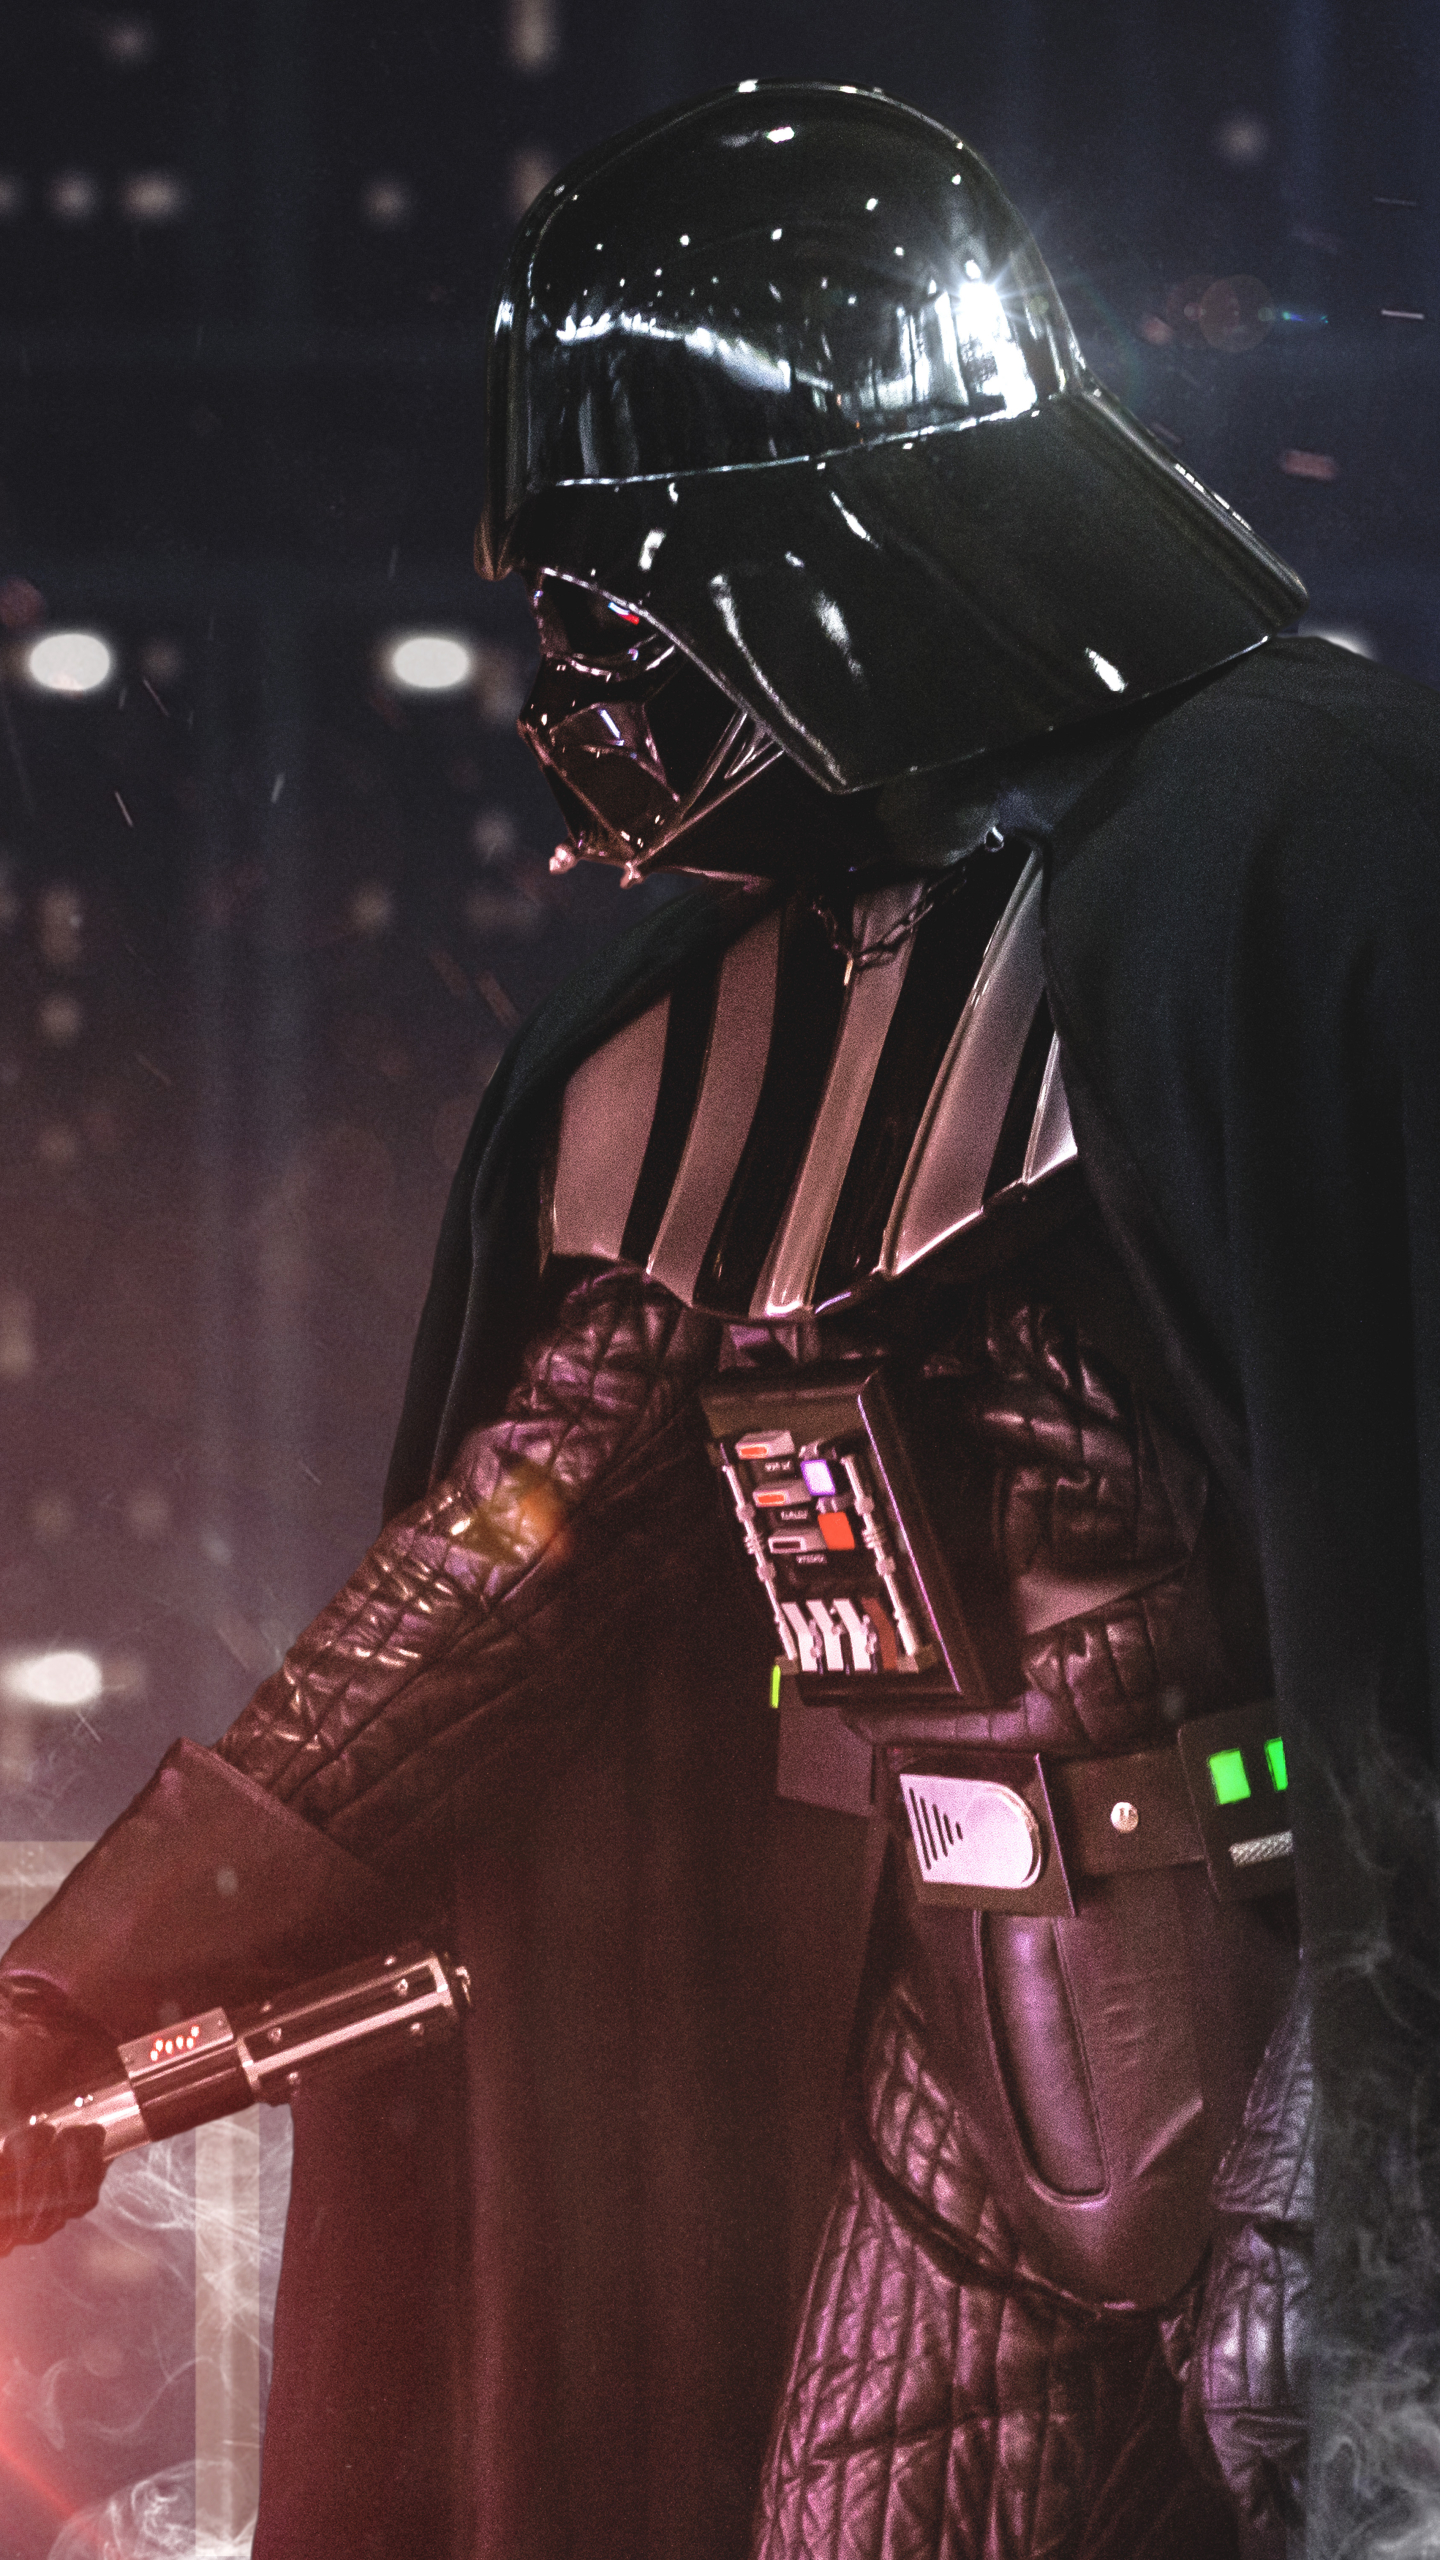 Free Download 4 Star Wars Episode V The Empire Strikes Back Appleiphone 7 Plus 1080x1920 For Your Desktop Mobile Tablet Explore 36 Star Wars Episode V The Empire Strikes